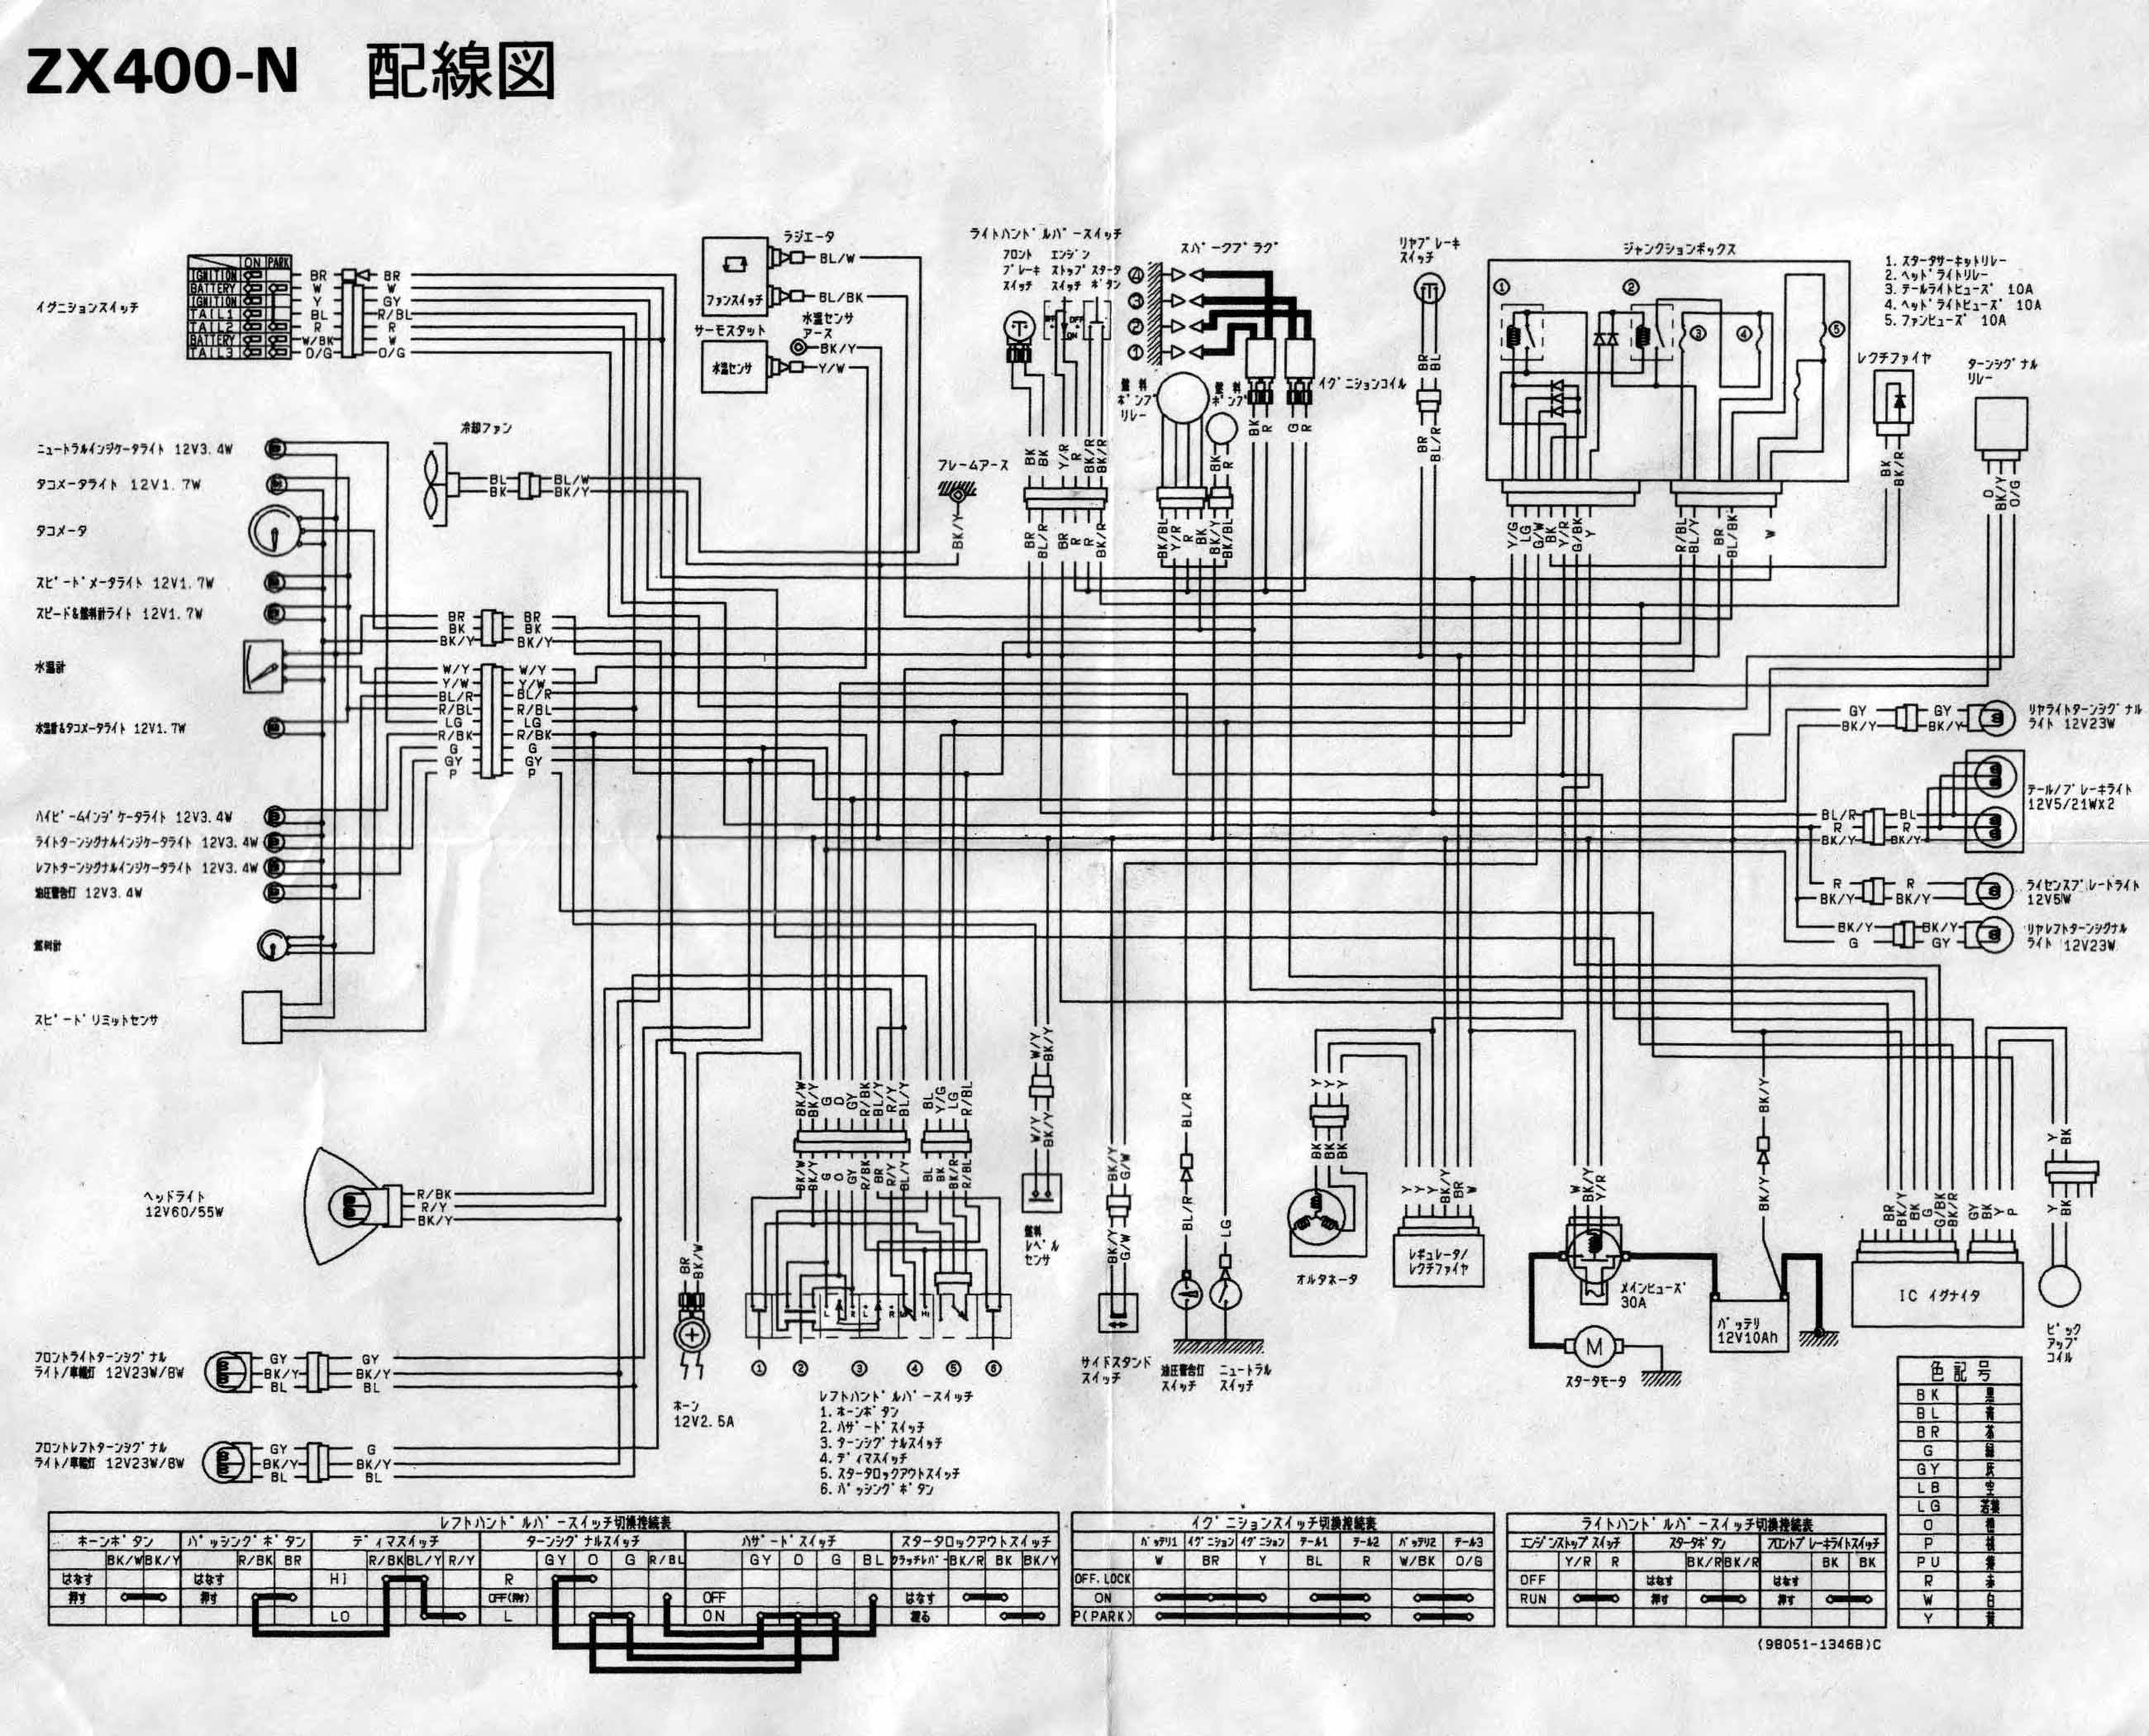 1987 kawasaki ex500 ninja wiring diagram wiring diagrams rh 6 hyt gutachter holtkamp de